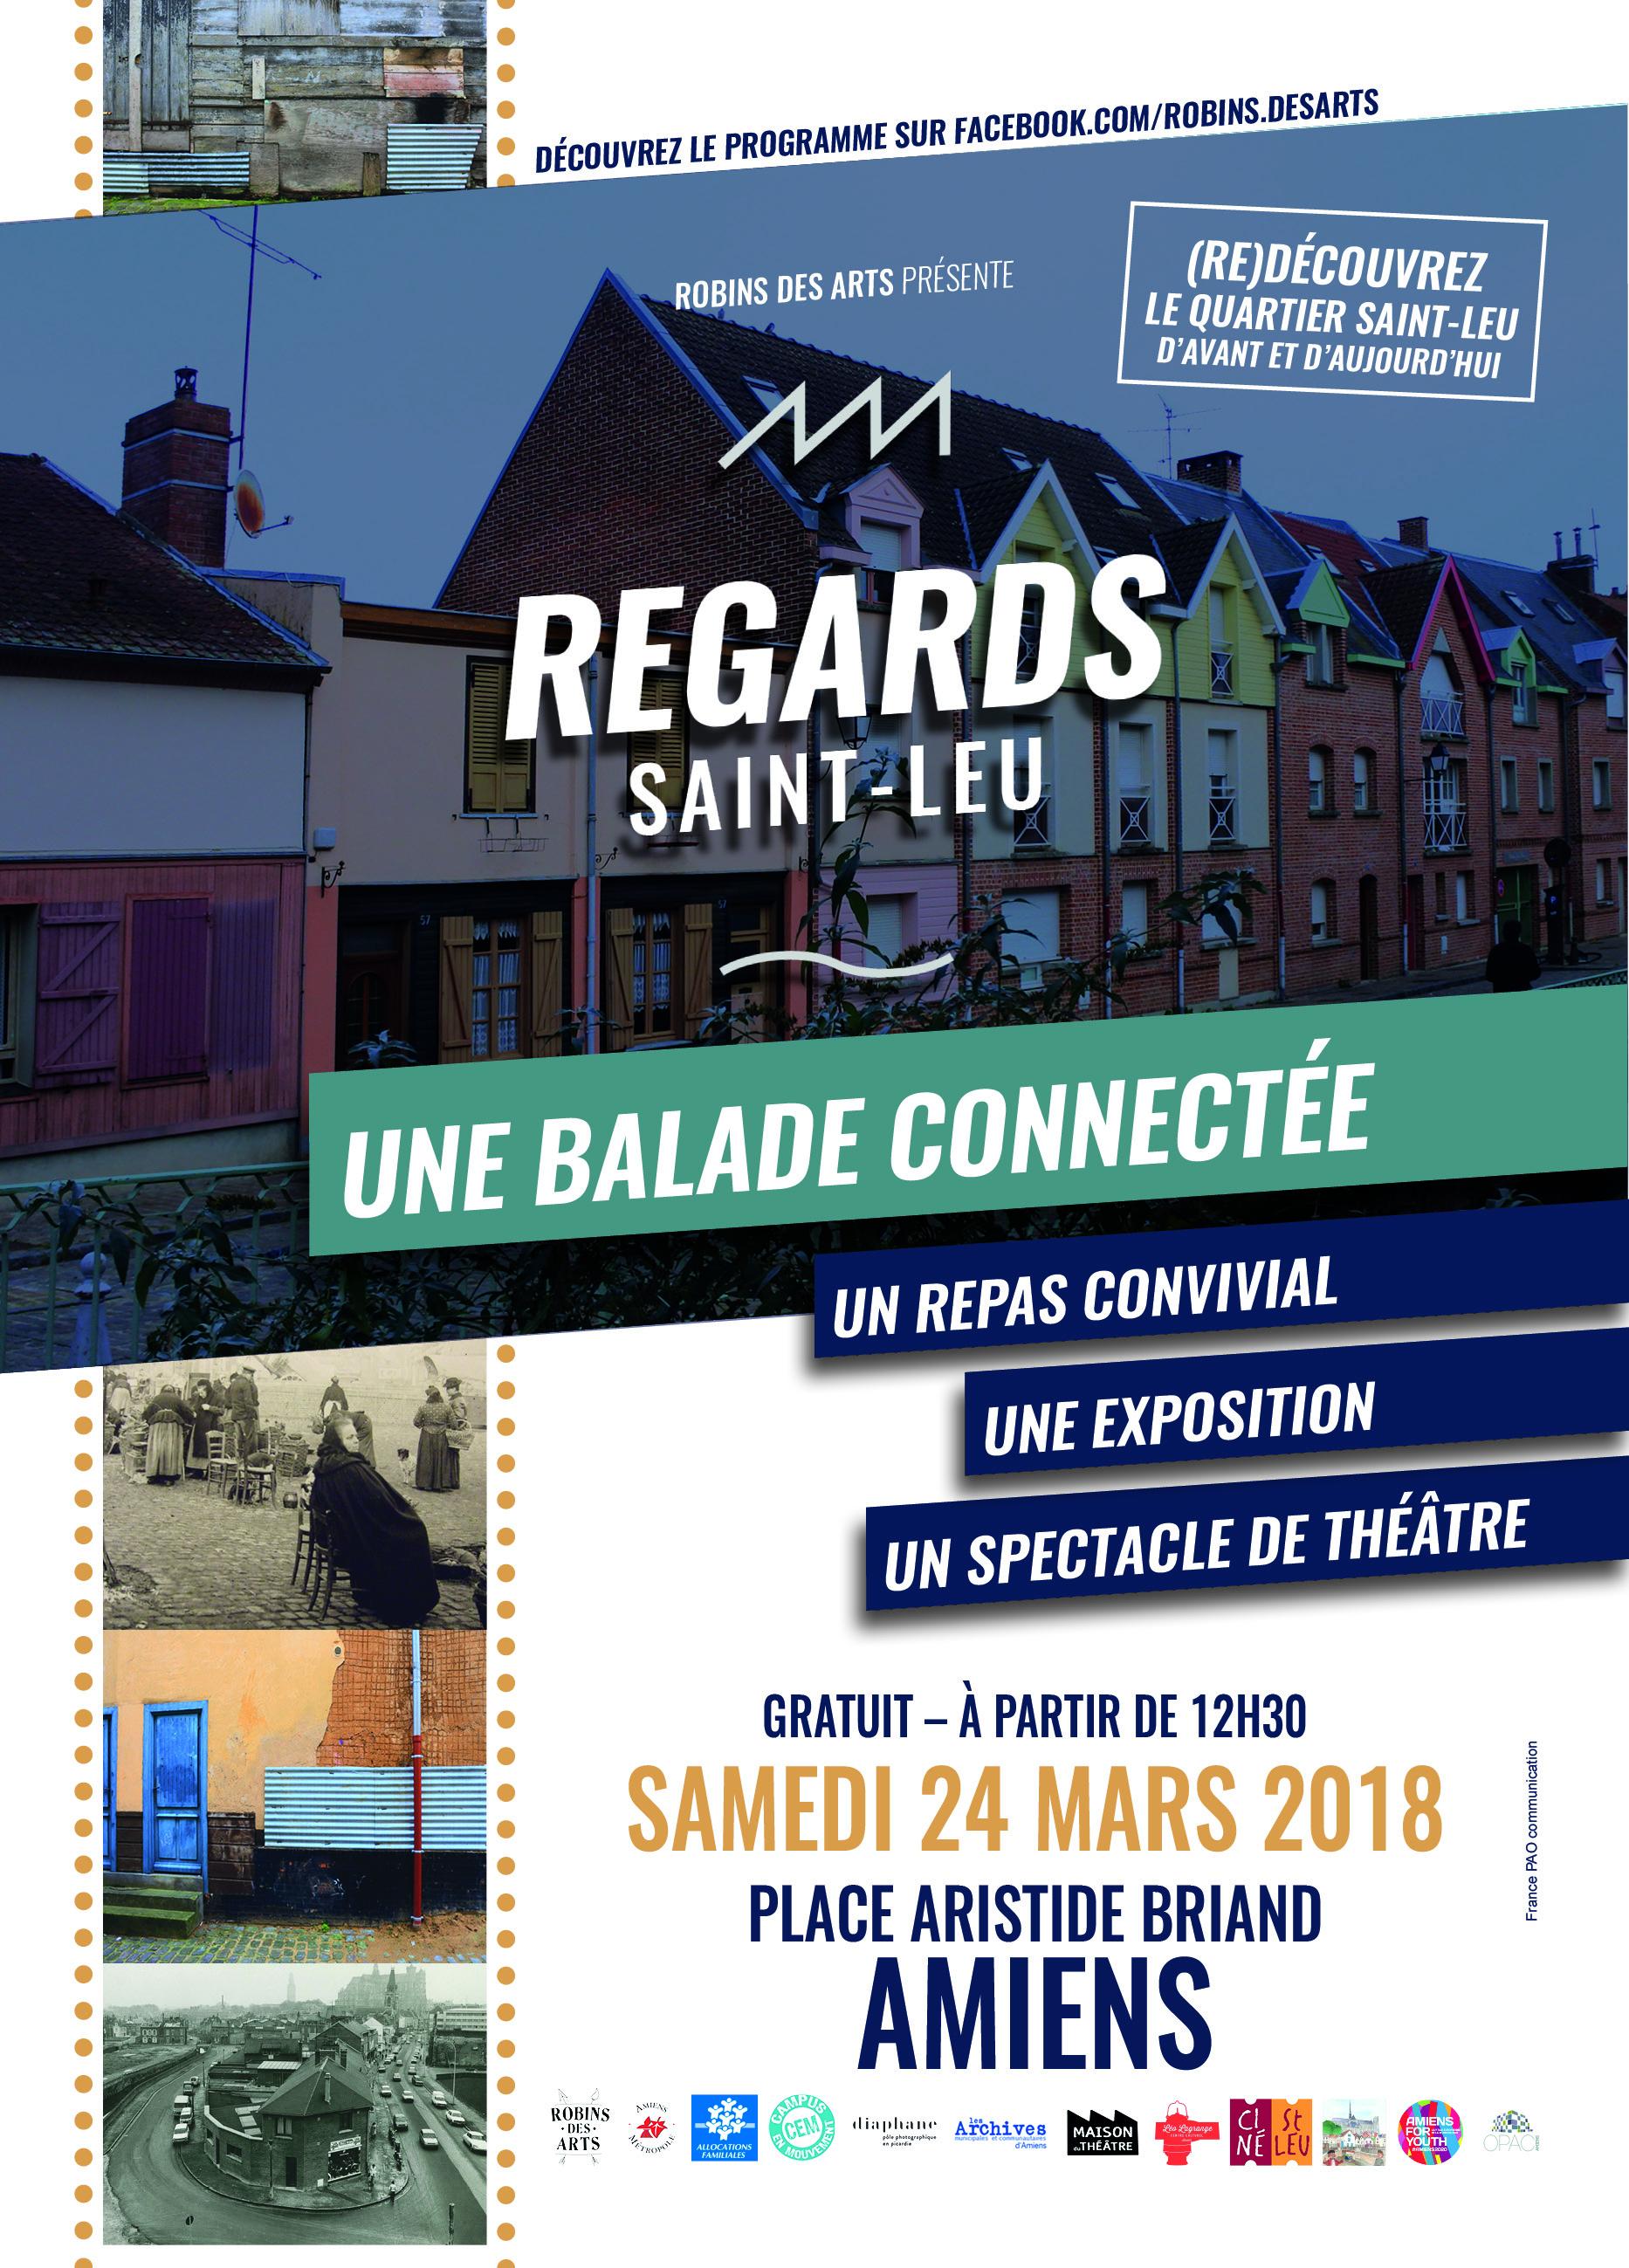 Regards Saint-Leu Affiche